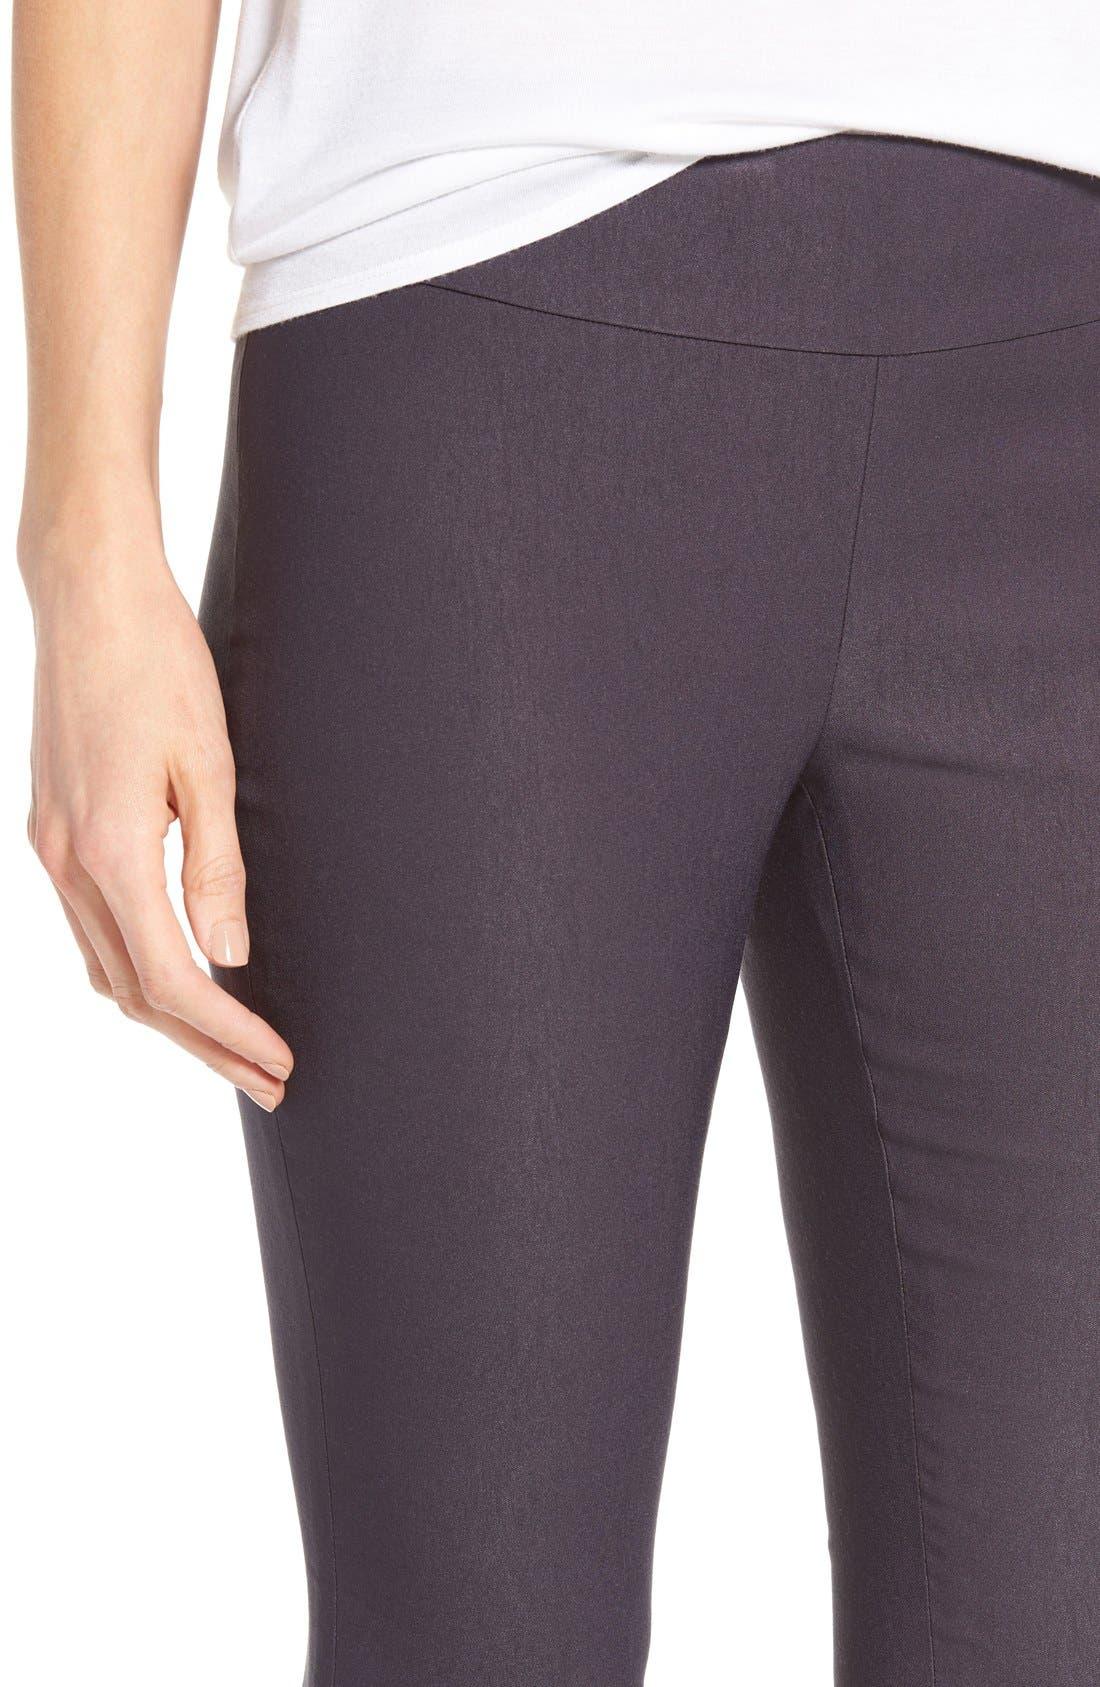 'The Wonder Stretch' Slim Leg Pants,                             Alternate thumbnail 26, color,